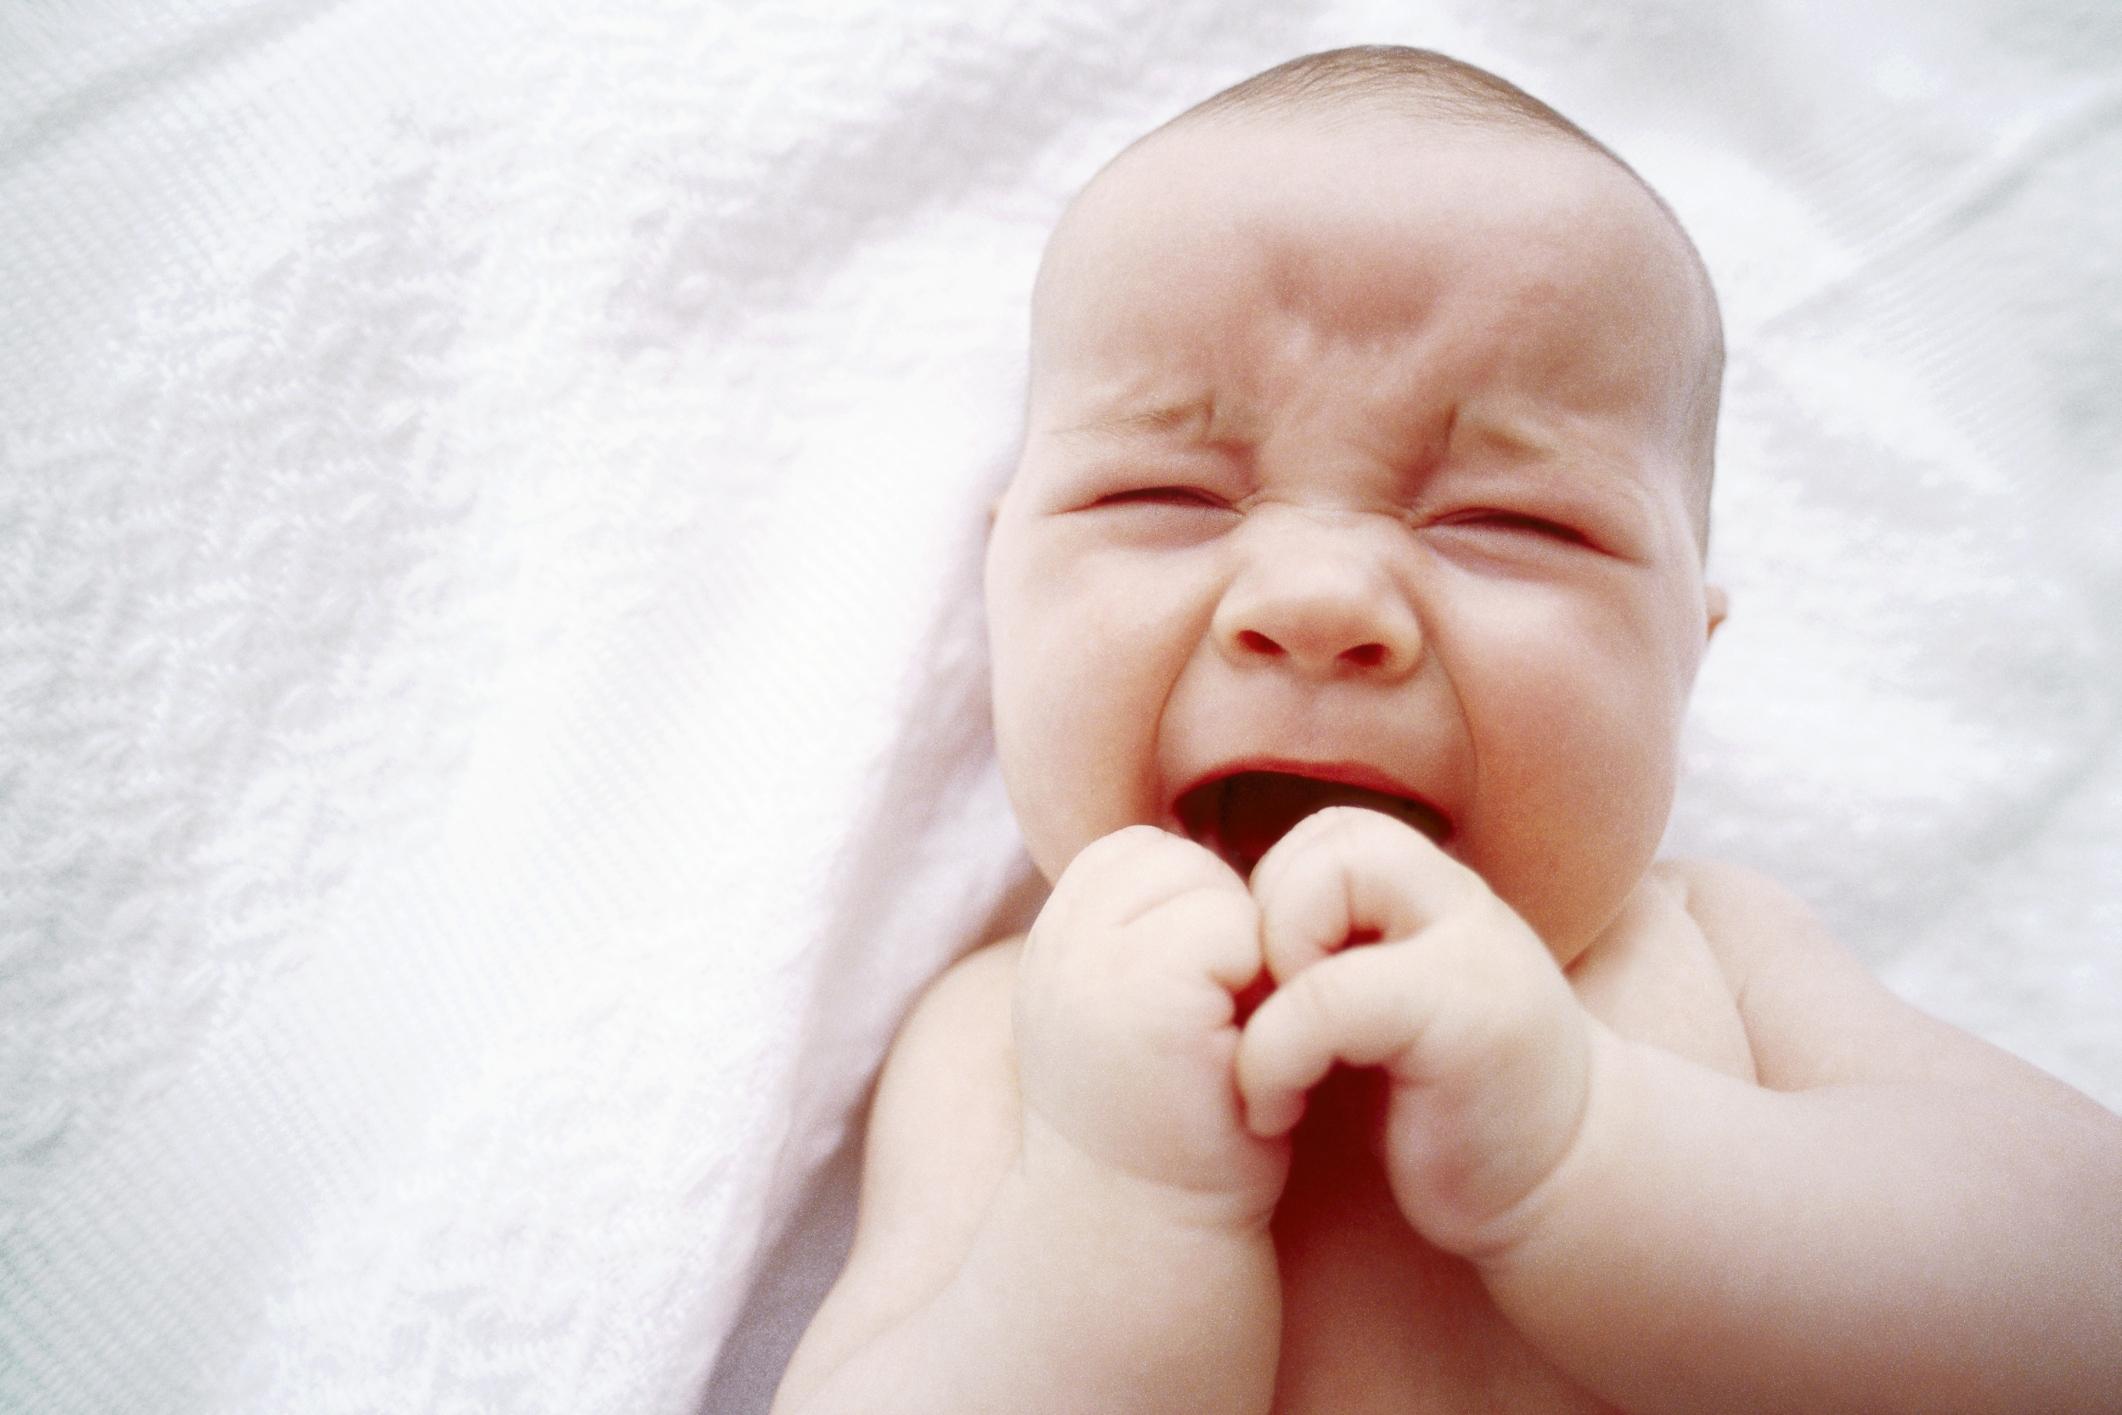 Blotchy Skin Rash on a Baby's Face